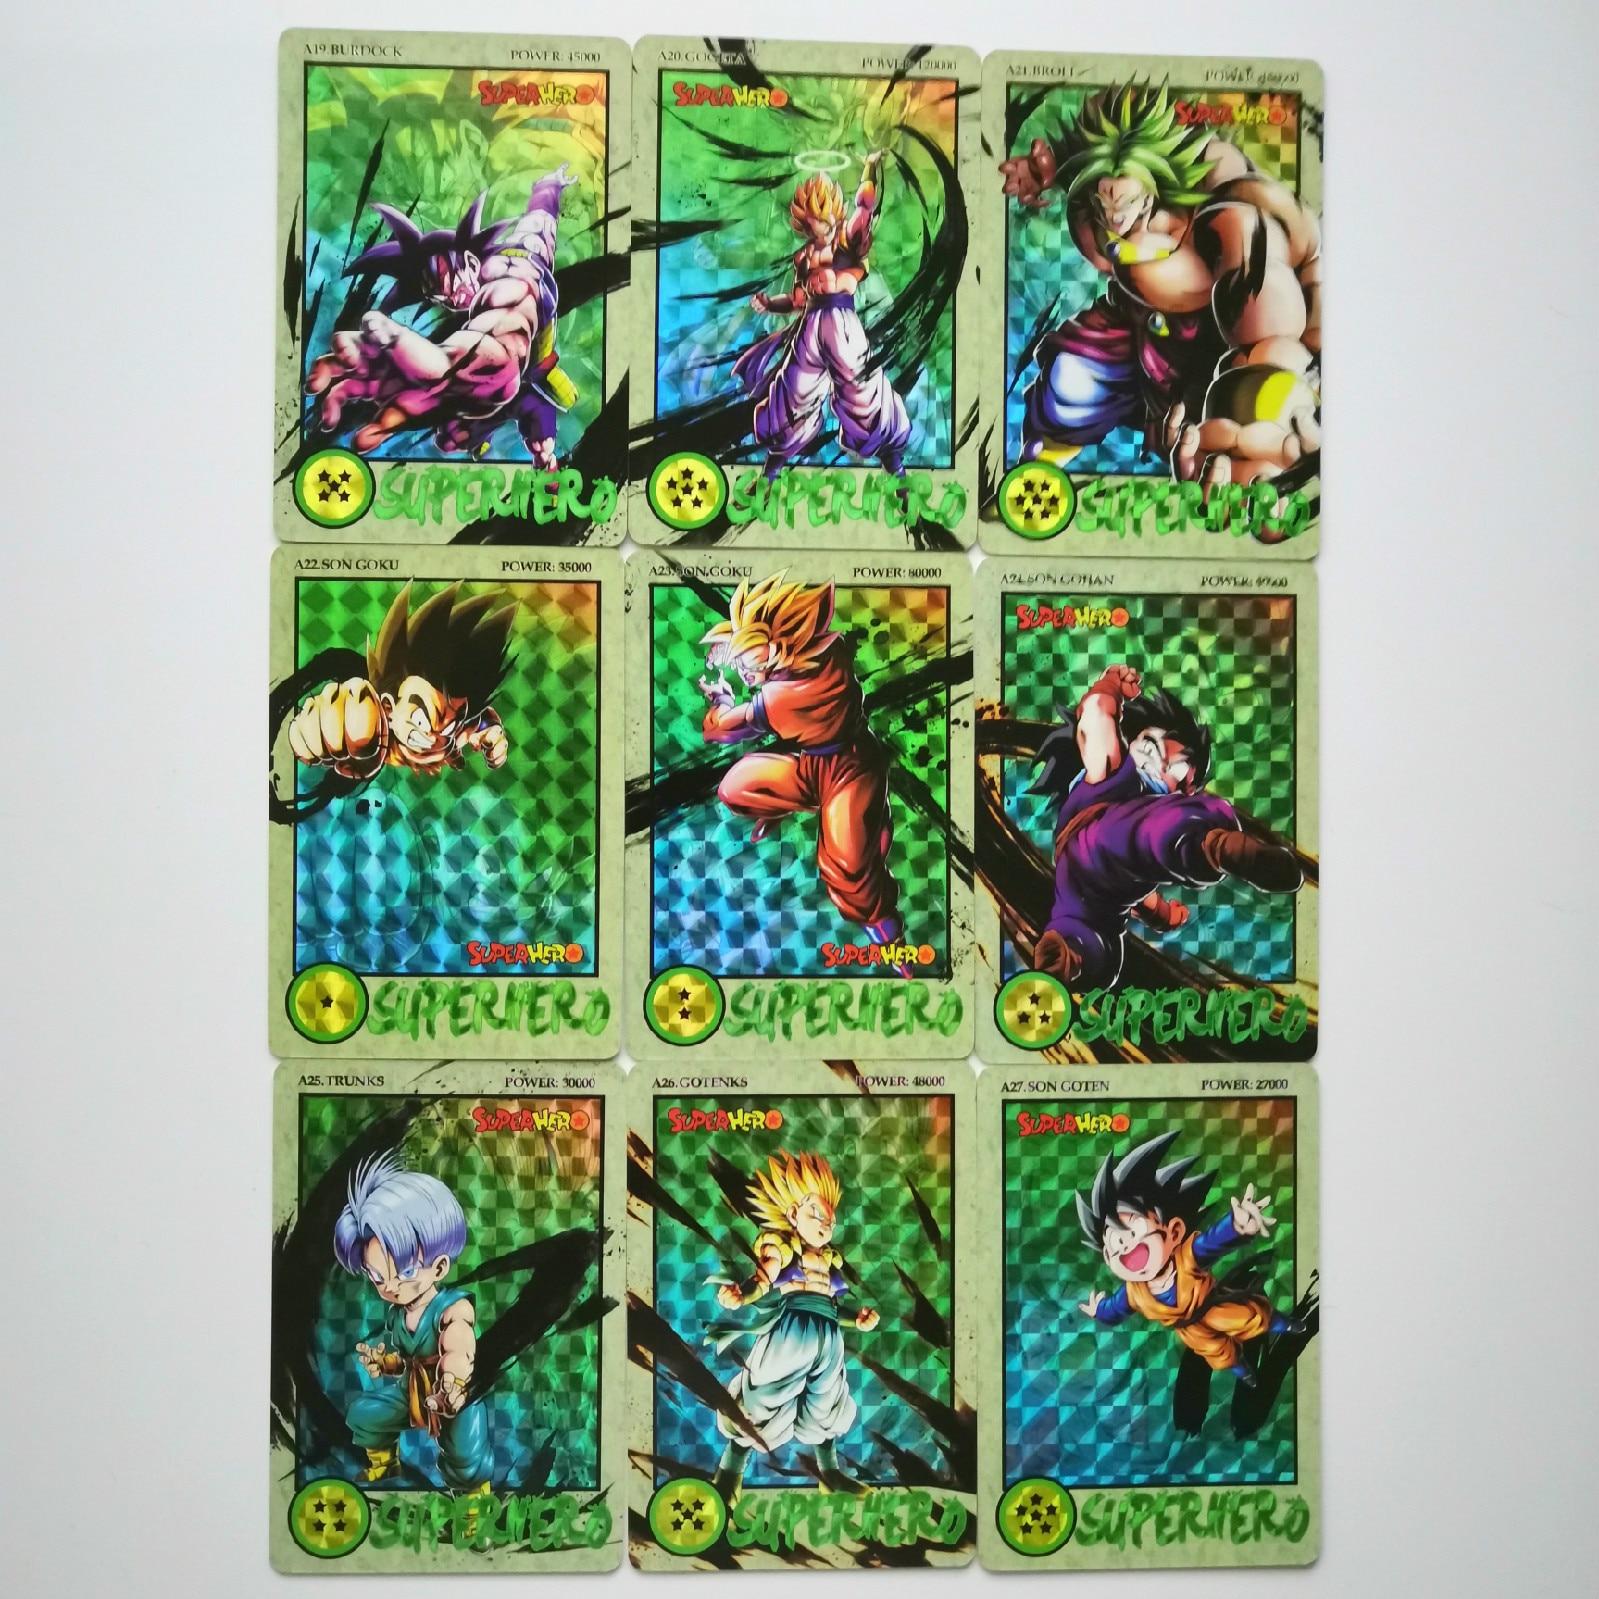 36pcs/set Super Dragon Ball Z Ink Relief Heroes Battle Card Ultra Instinct Goku Vegeta Super Game Collection Cards